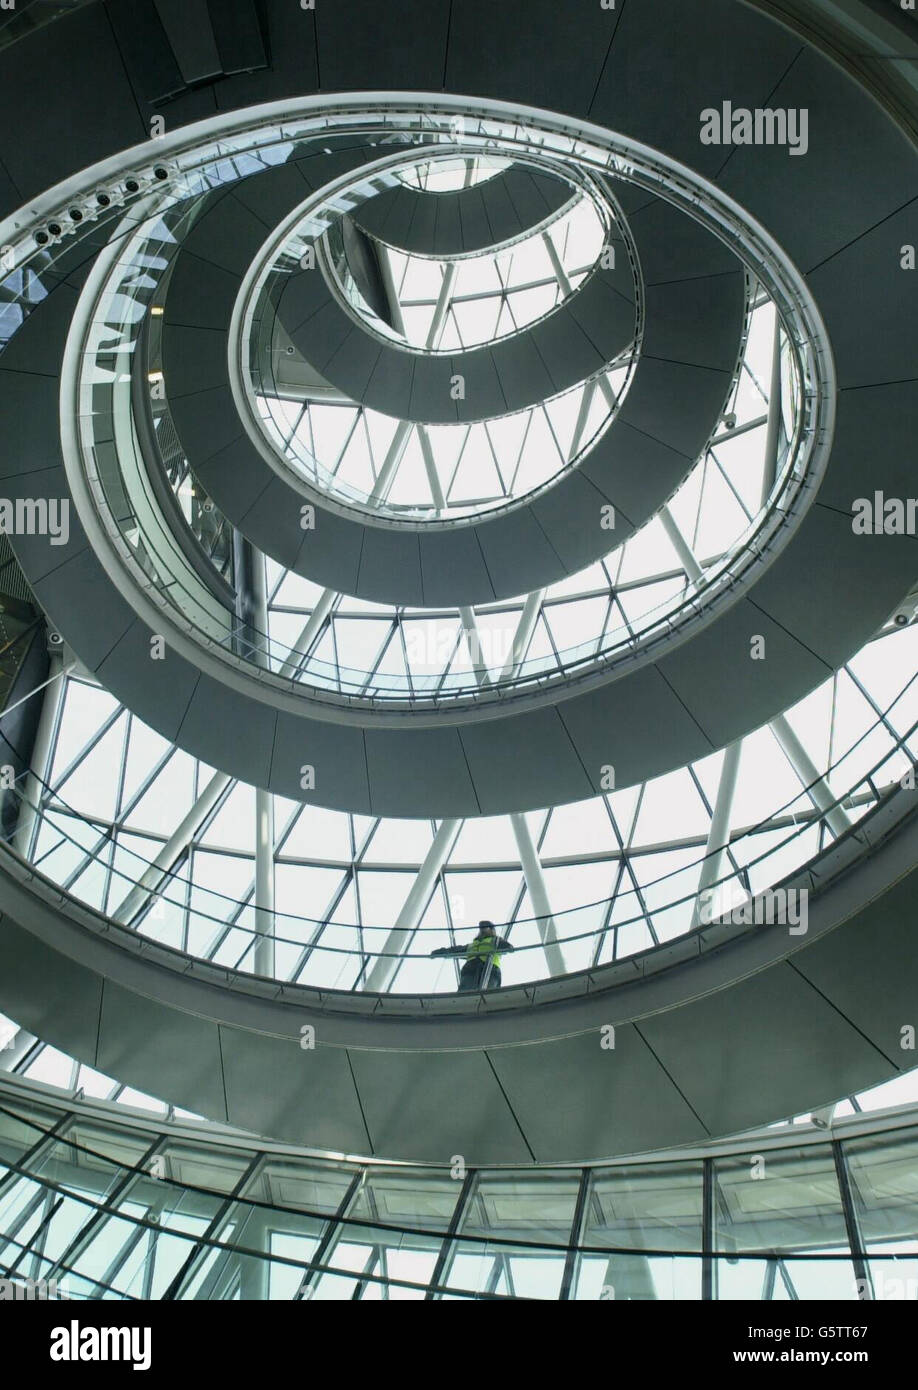 New GLA (Greater London Authority) headquarters - Stock Image